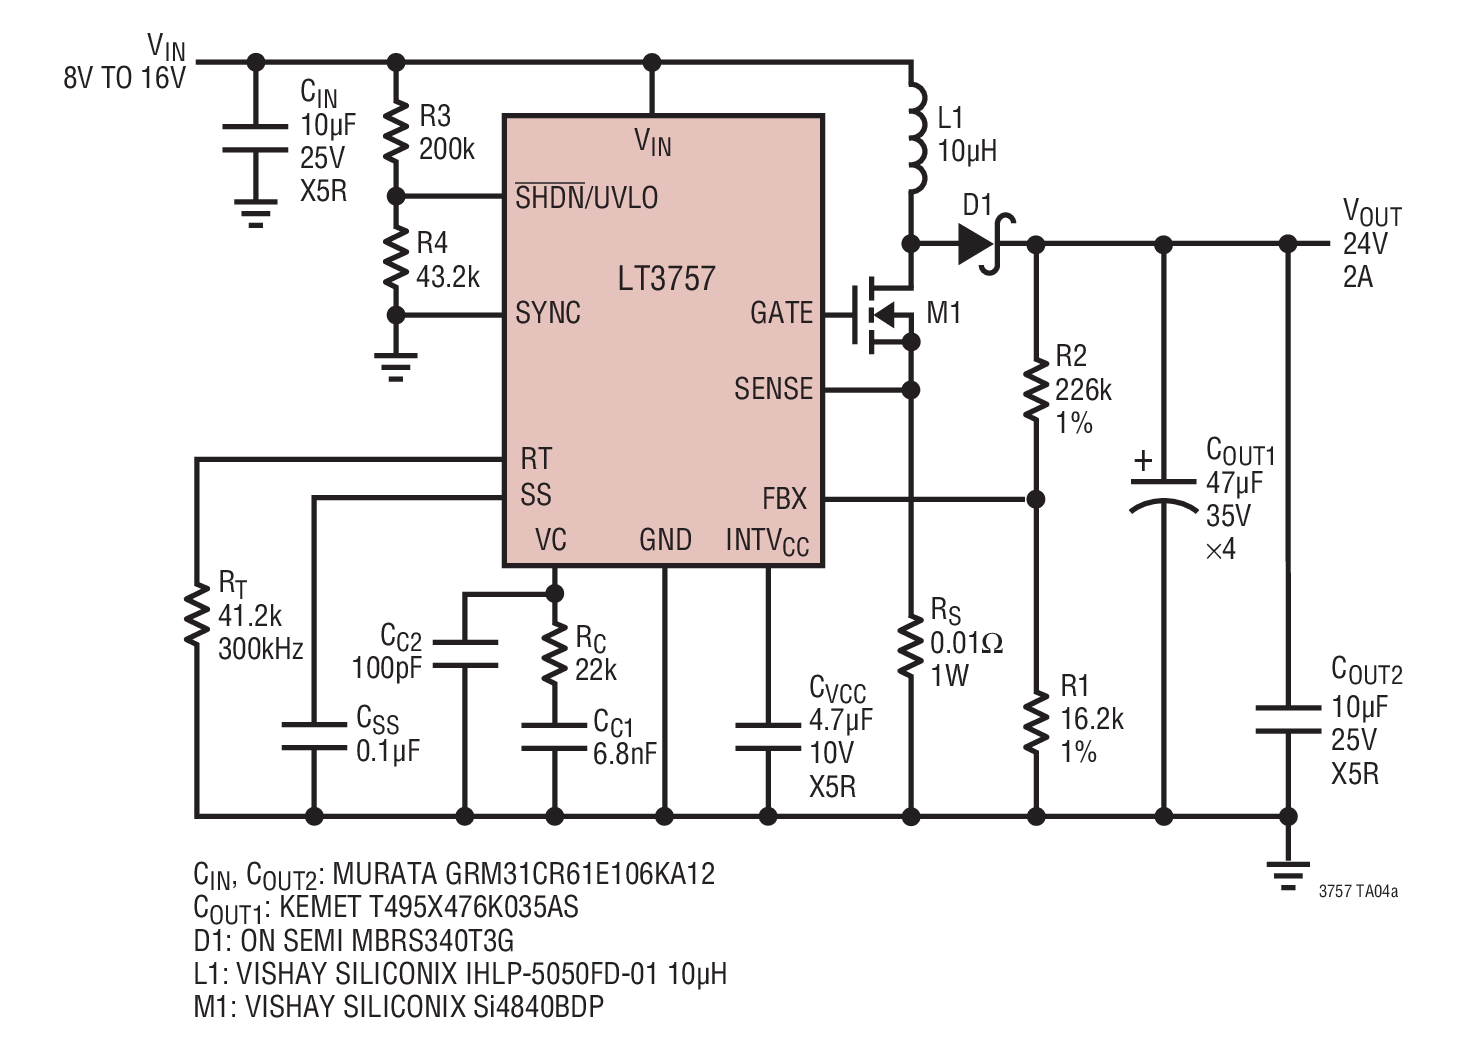 12vdc to 12vac converter circuit diagram how make a venn lt3757 8v 16v input 24v 2a output boost